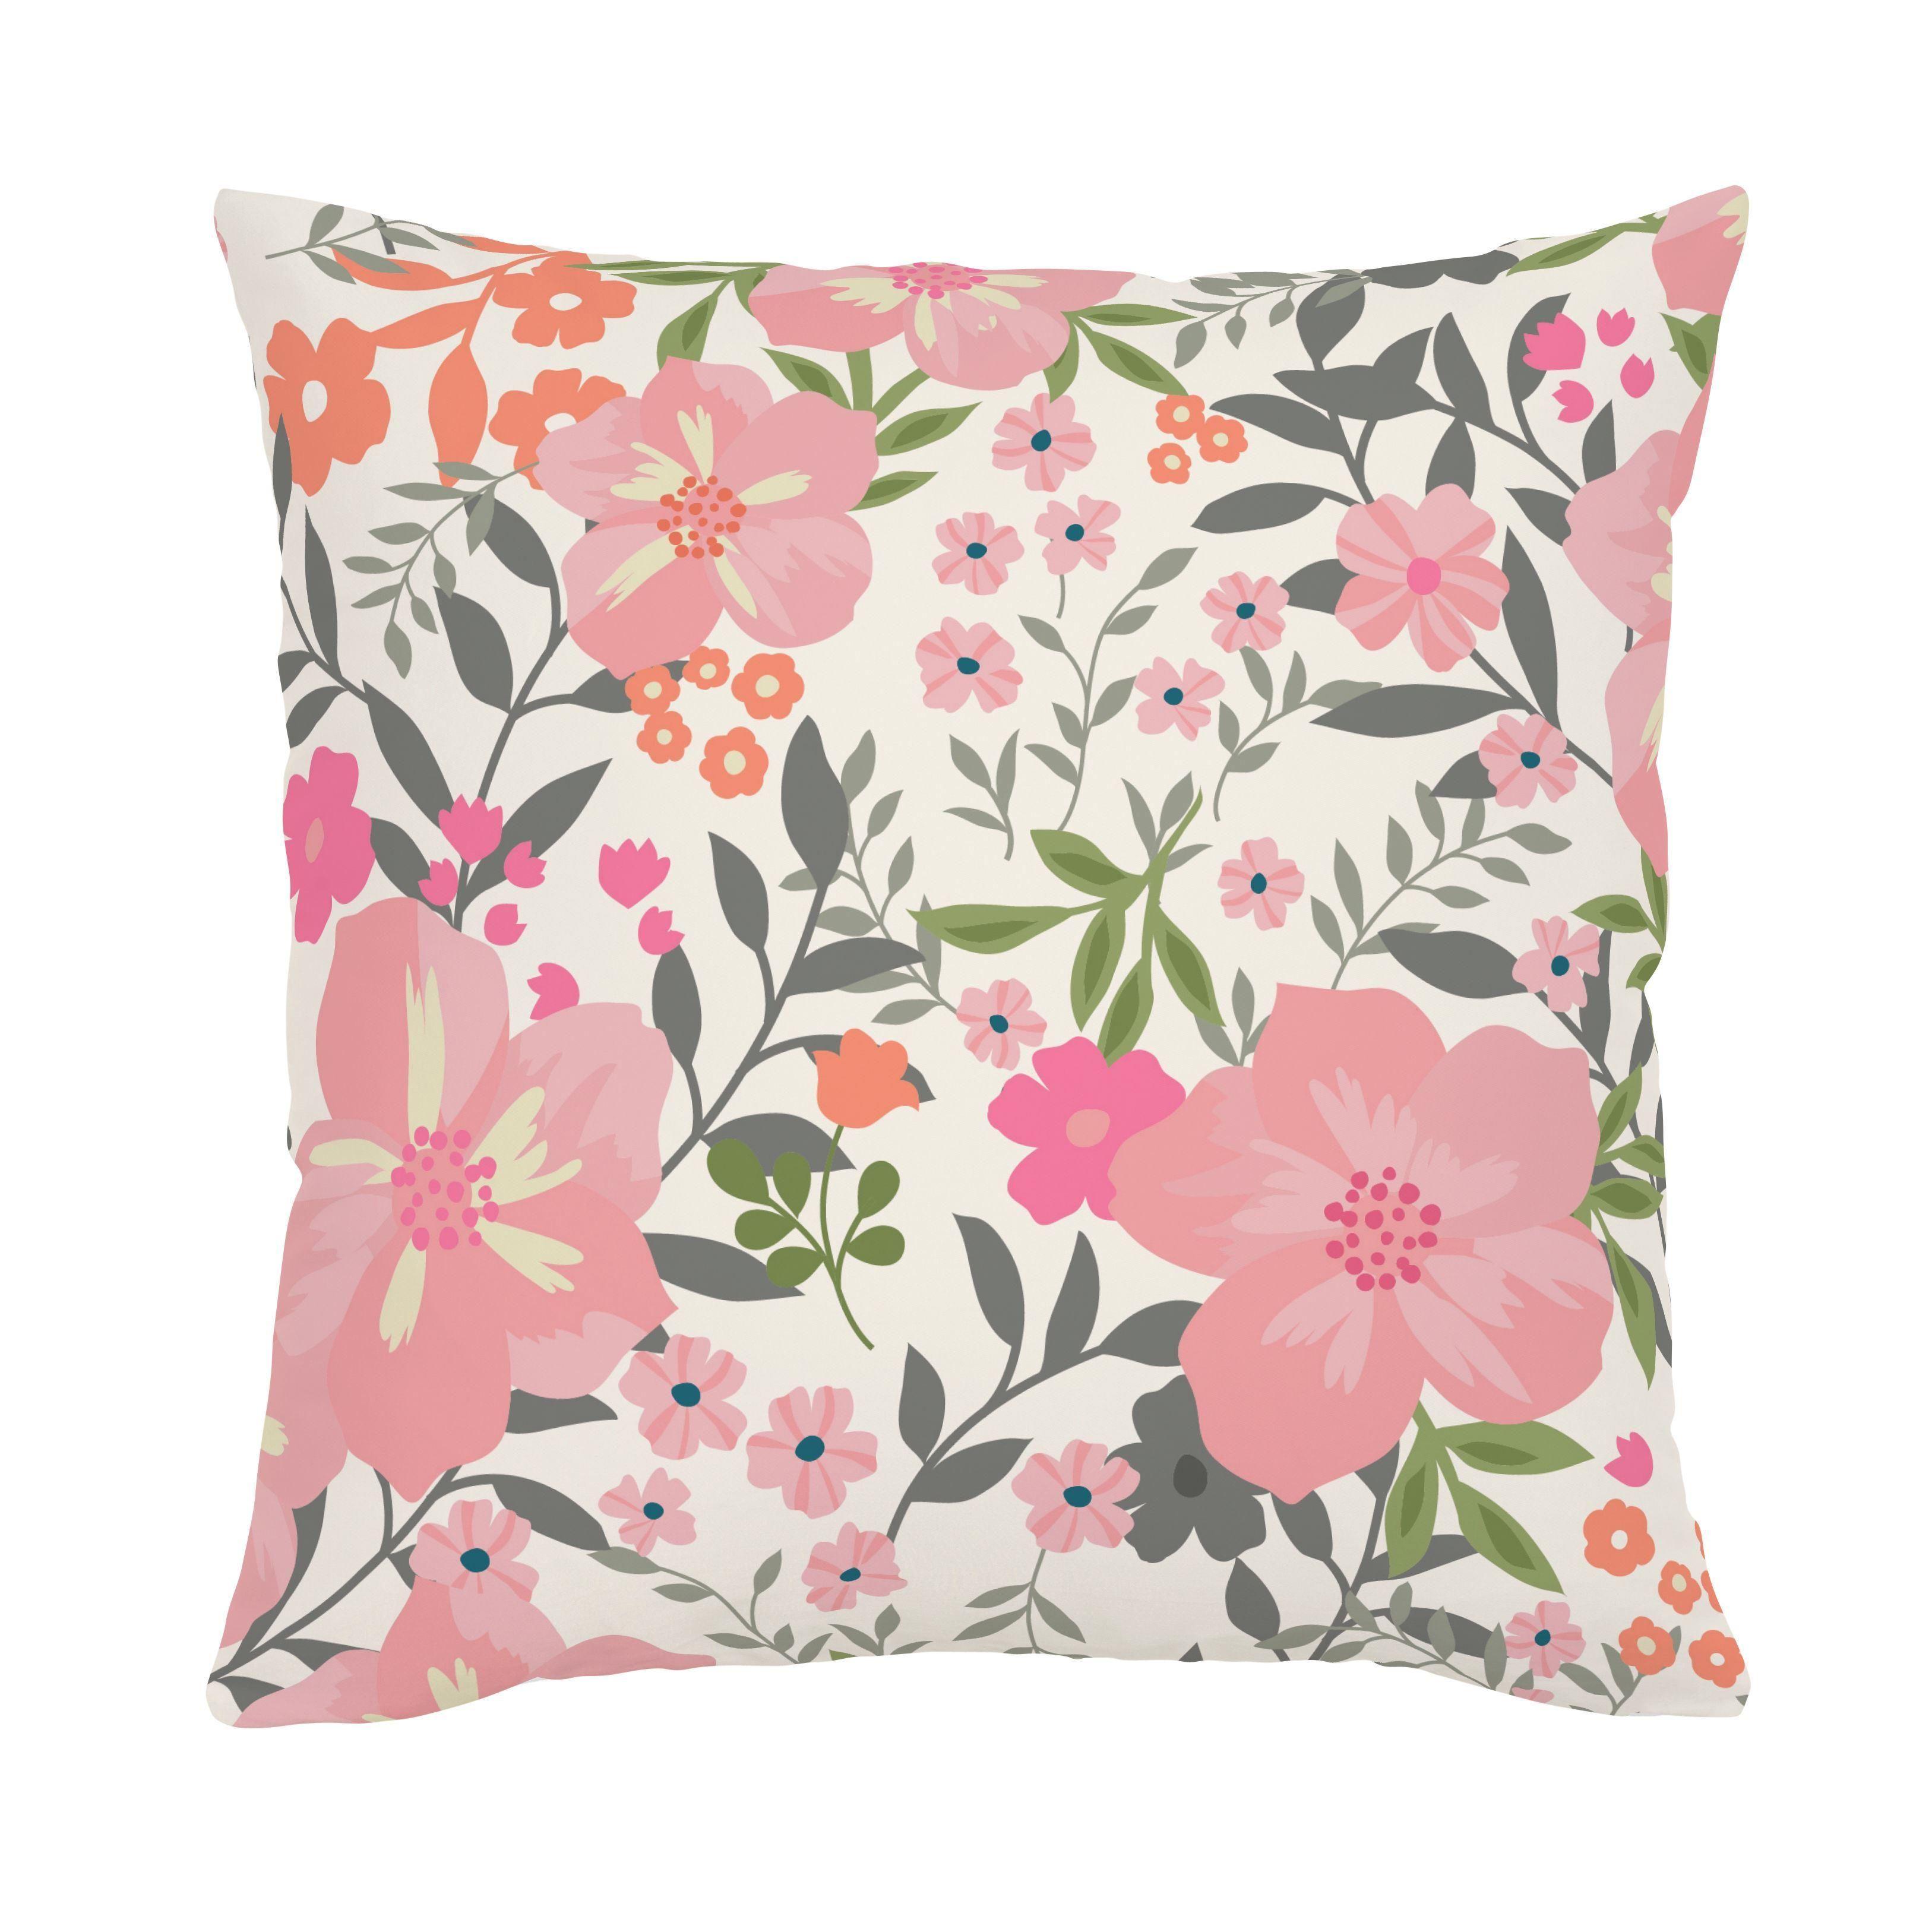 Pink and orange floral tropic throw pillow throw pillows and pillows